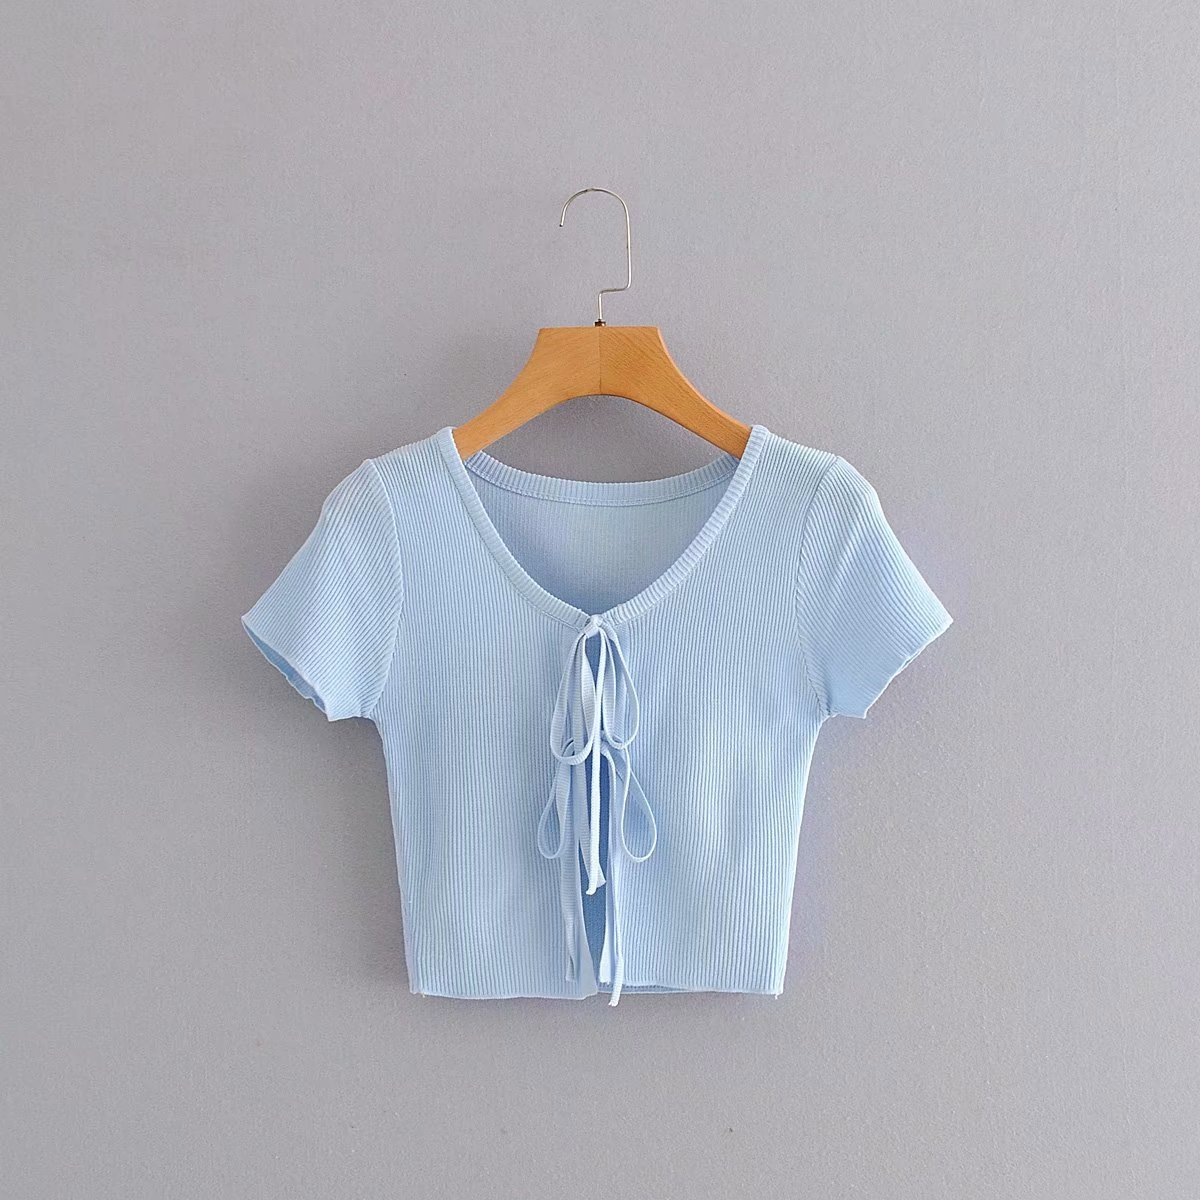 2020 Summer New European American Solid Color blue Short Lace zaraing vadiming sheining women blouse shirt tops clothes DJ20